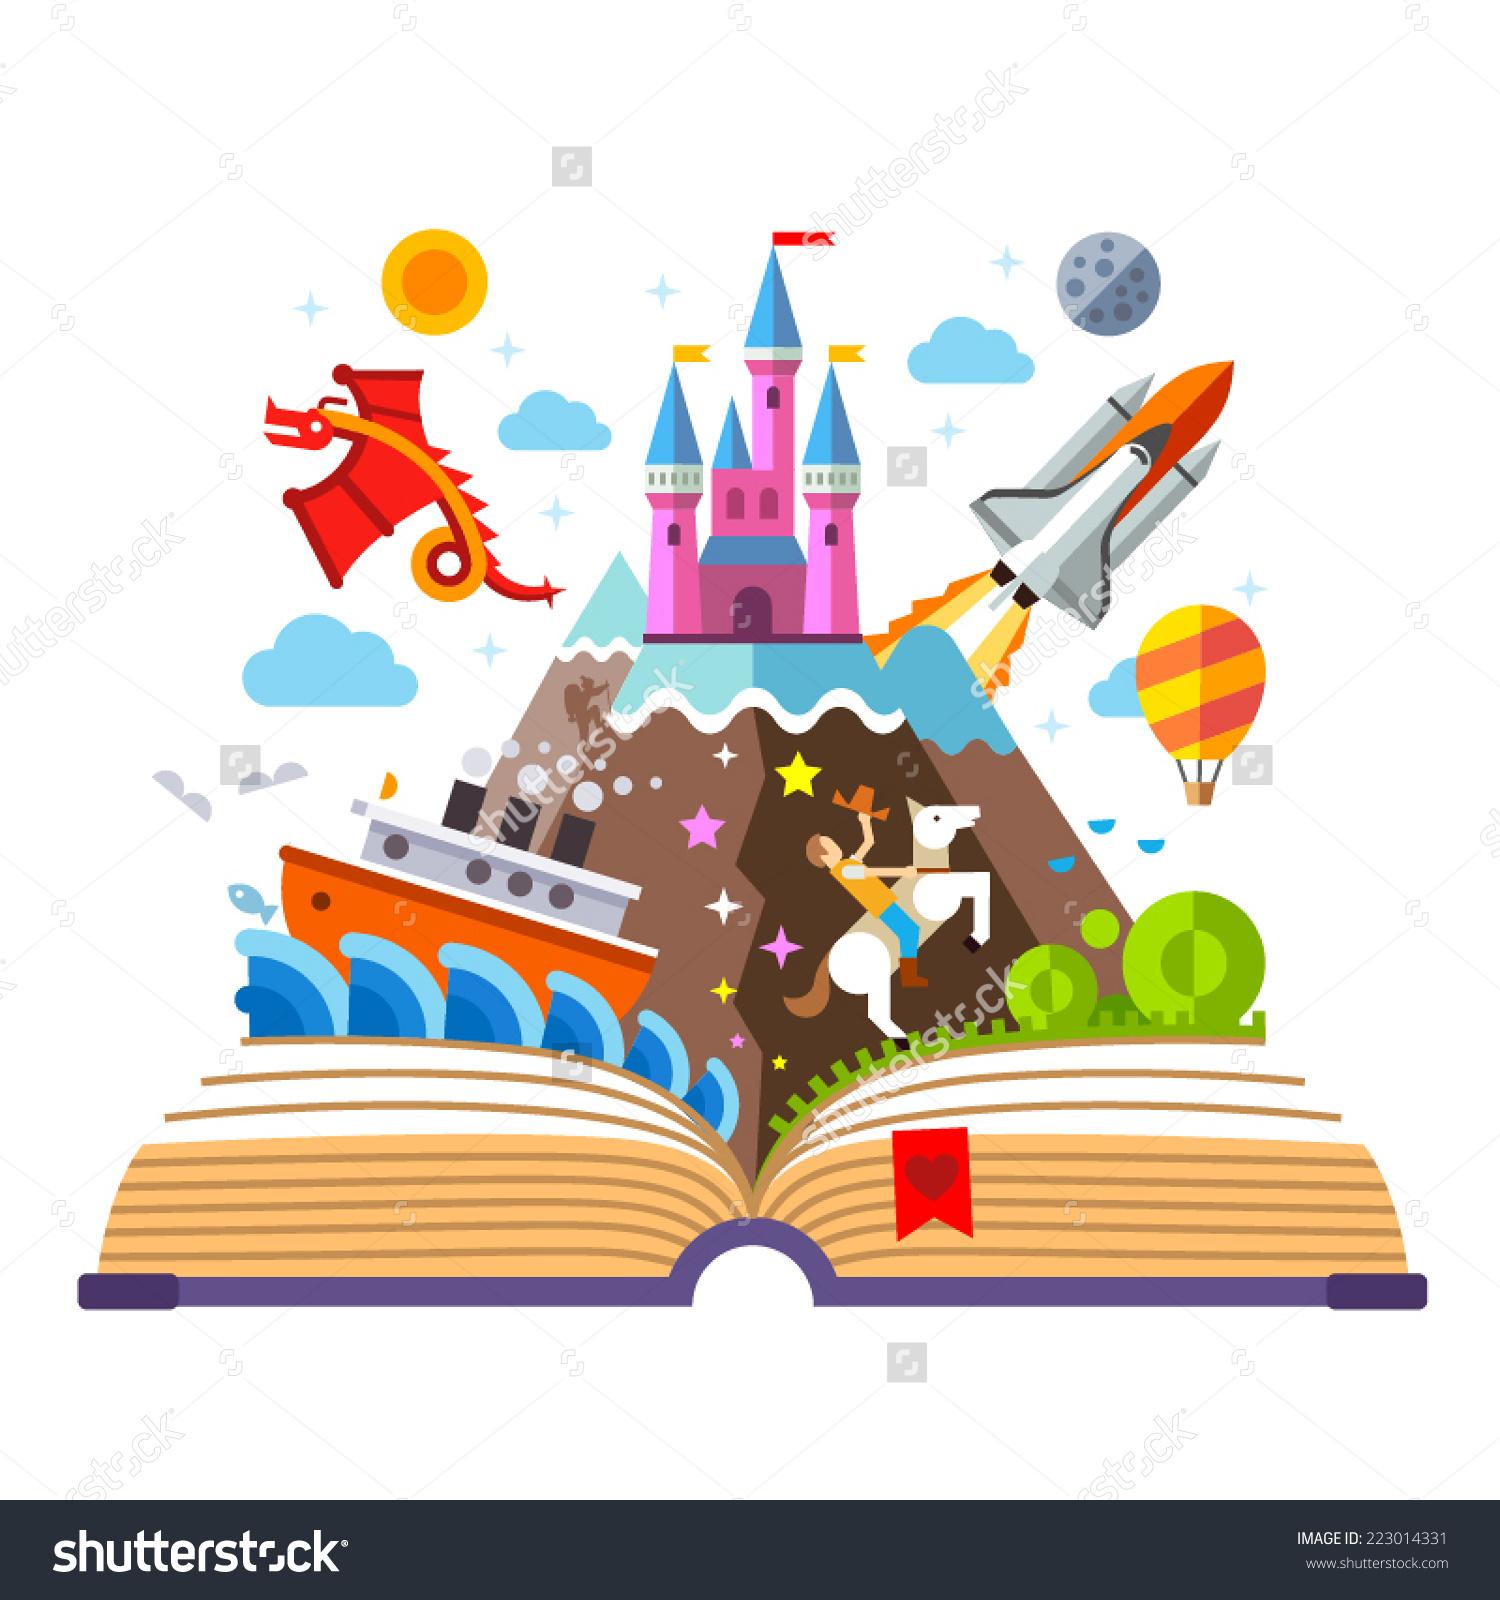 Imagination clipart Clipart 75650 Book Fantasy free